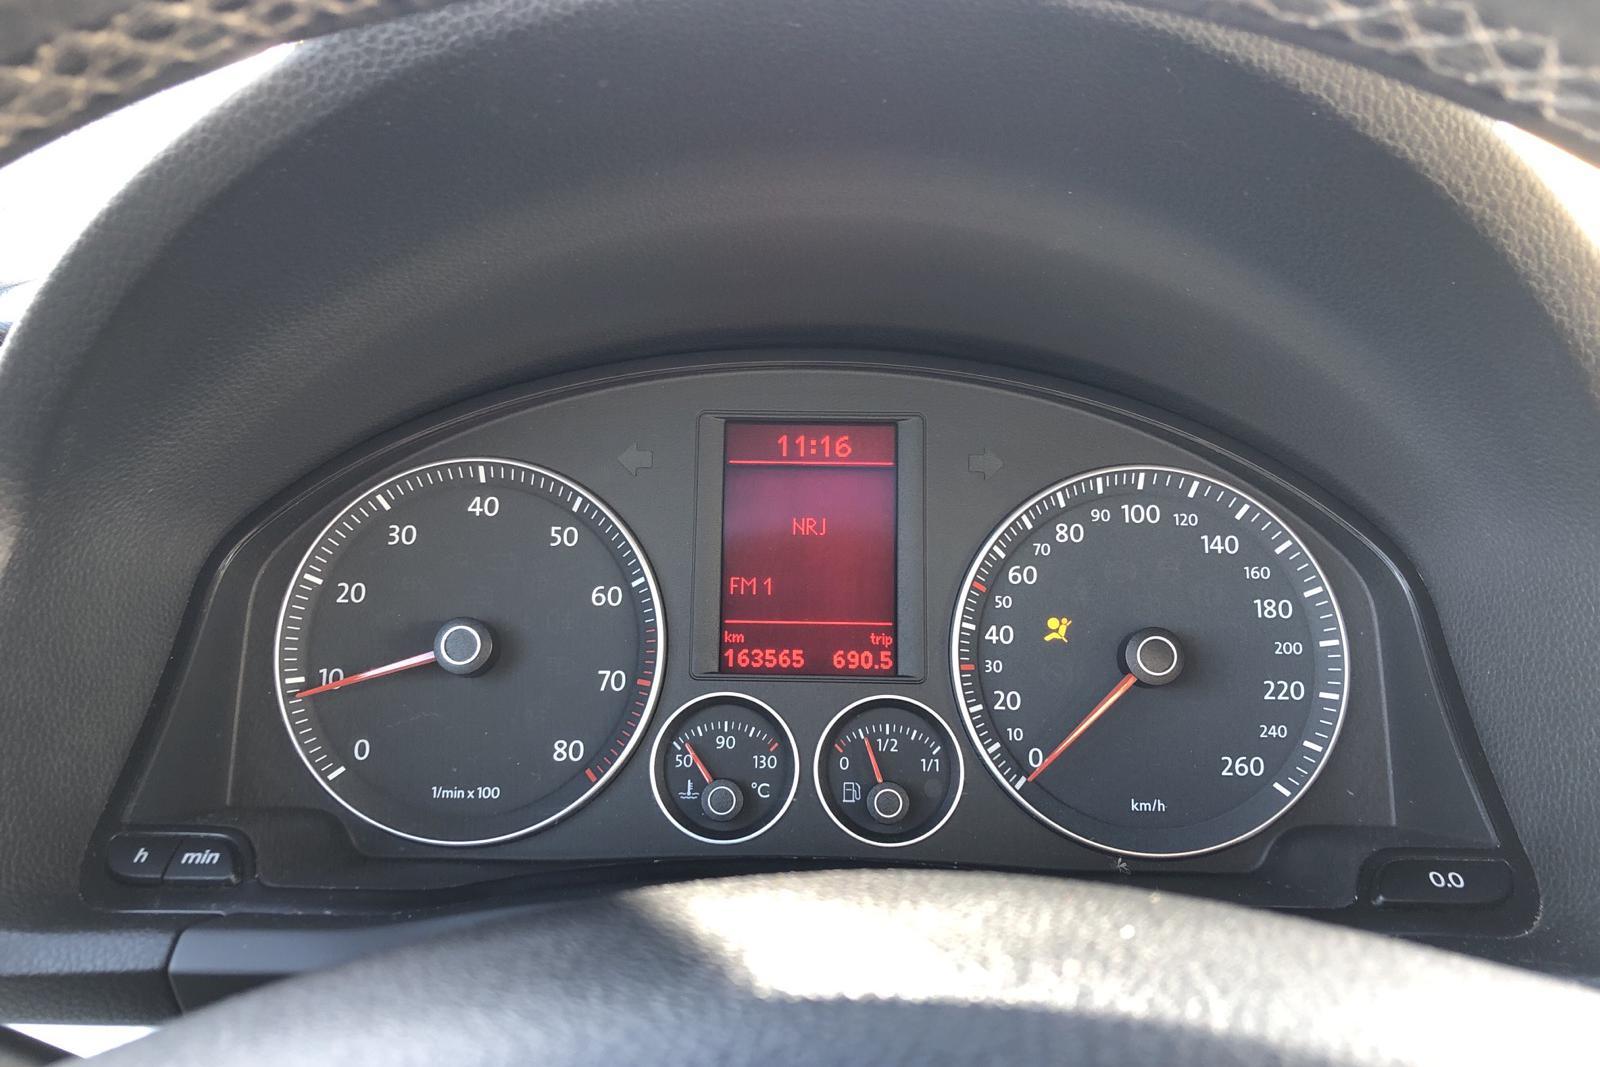 VW Eos 2.0 TFSI Cabriolet (200hk) - 163 560 km - Manual - black - 2006